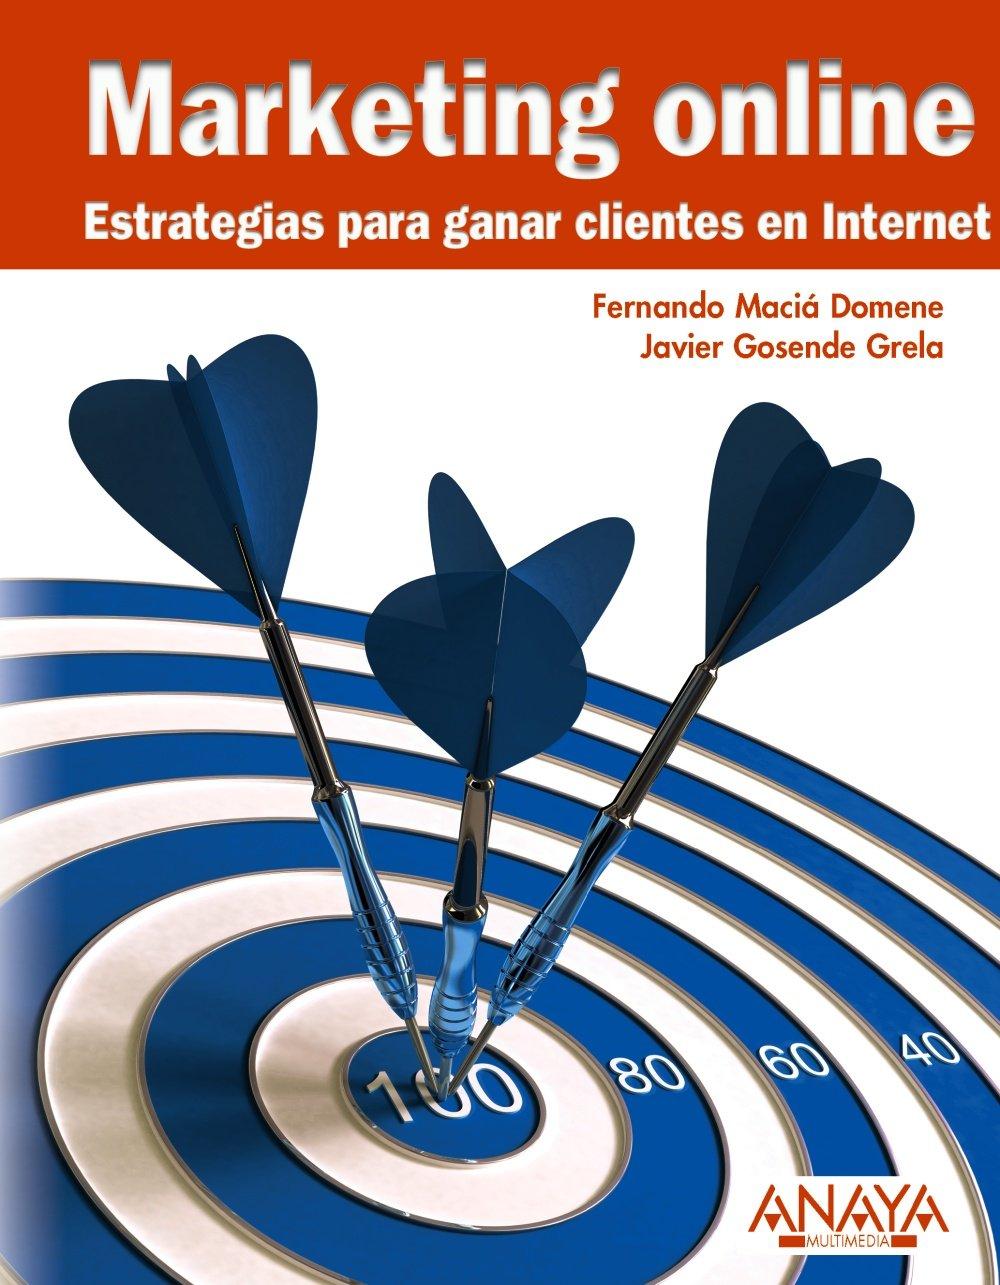 Marketing online.Estrategias para ganar clientes en Internet (Títulos Especiales) Tapa blanda – 7 jun 2010 Fernando Maciá Domene Javier Gosende Grela ANAYA MULTIMEDIA 8441527644